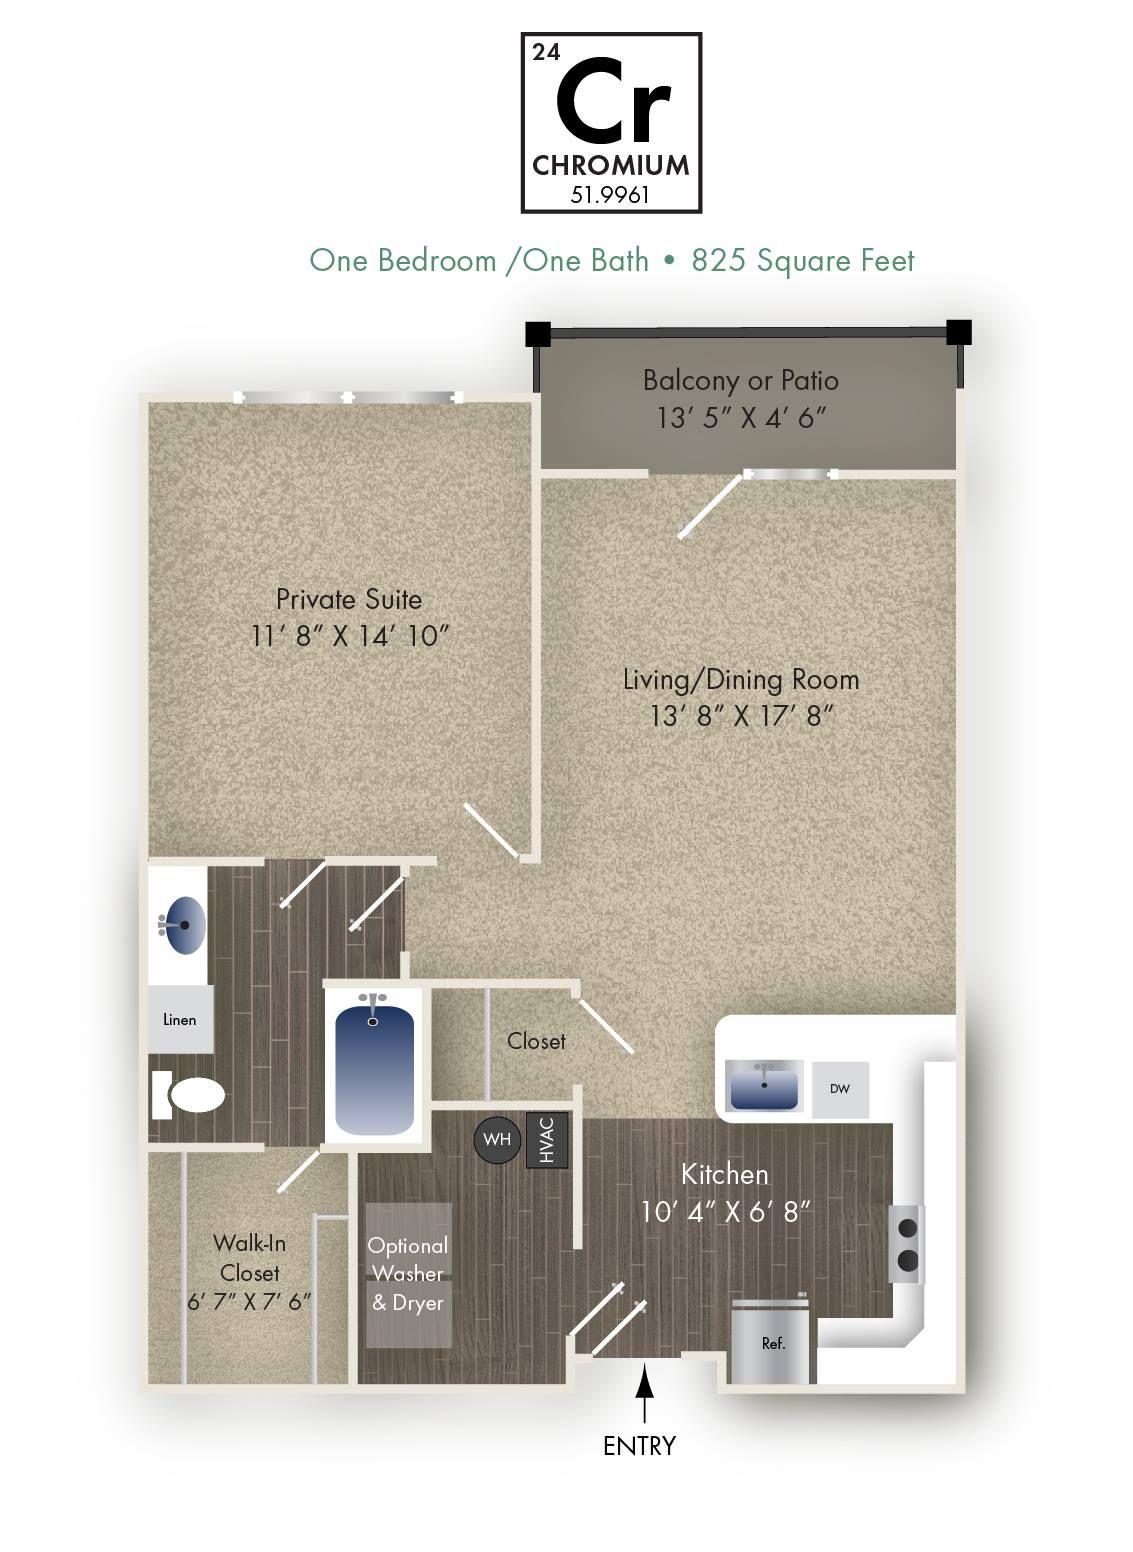 Chromium Apartment Living Dining Room Dayton